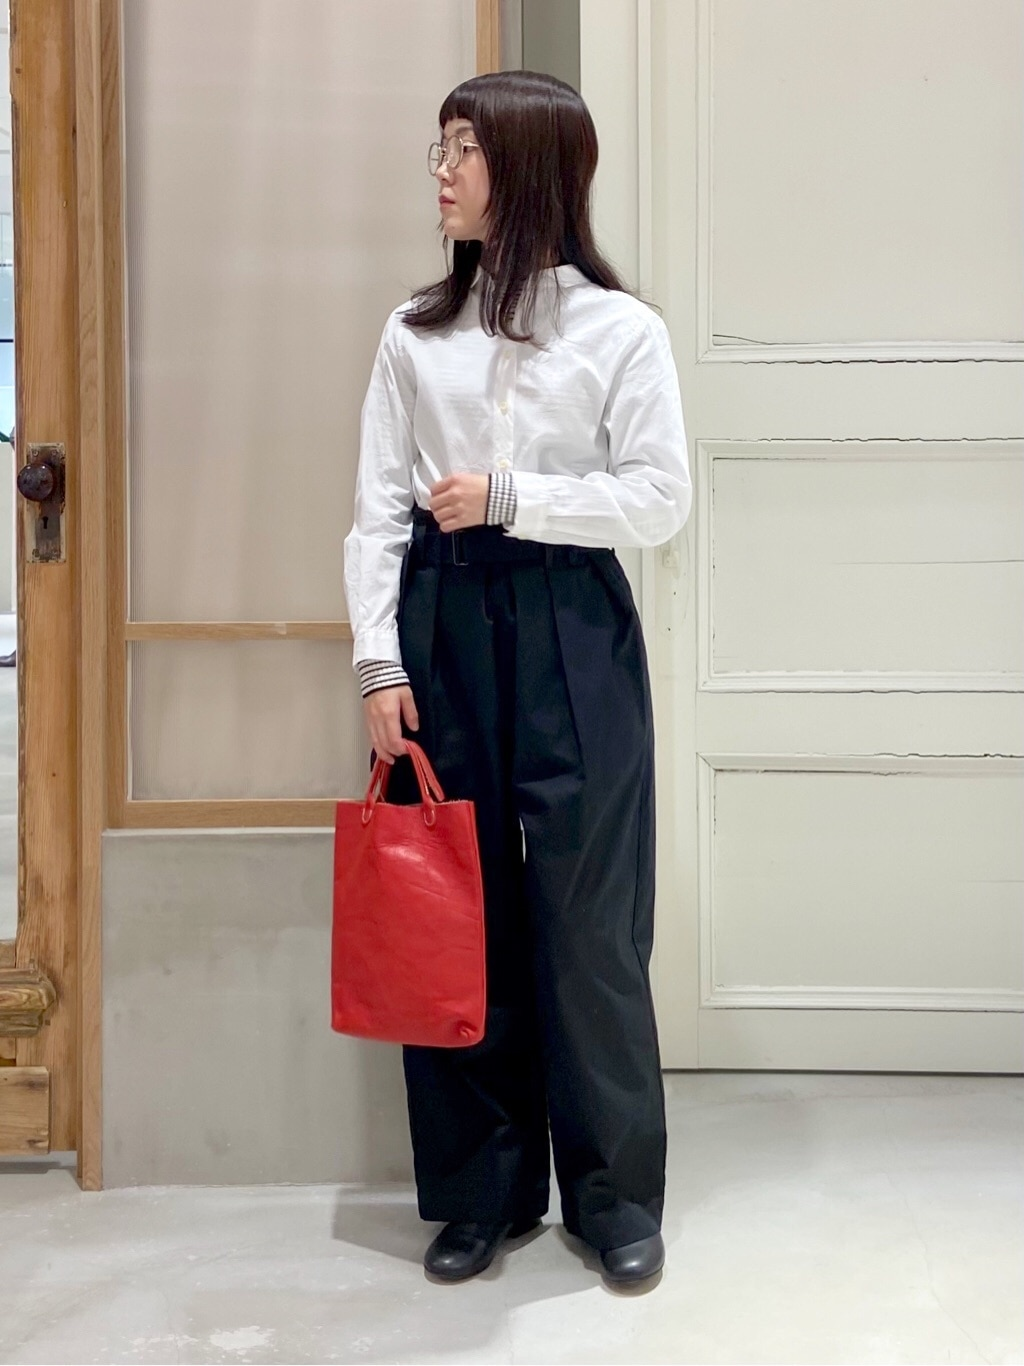 bulle de savon 渋谷スクランブルスクエア 身長:153cm 2021.01.21